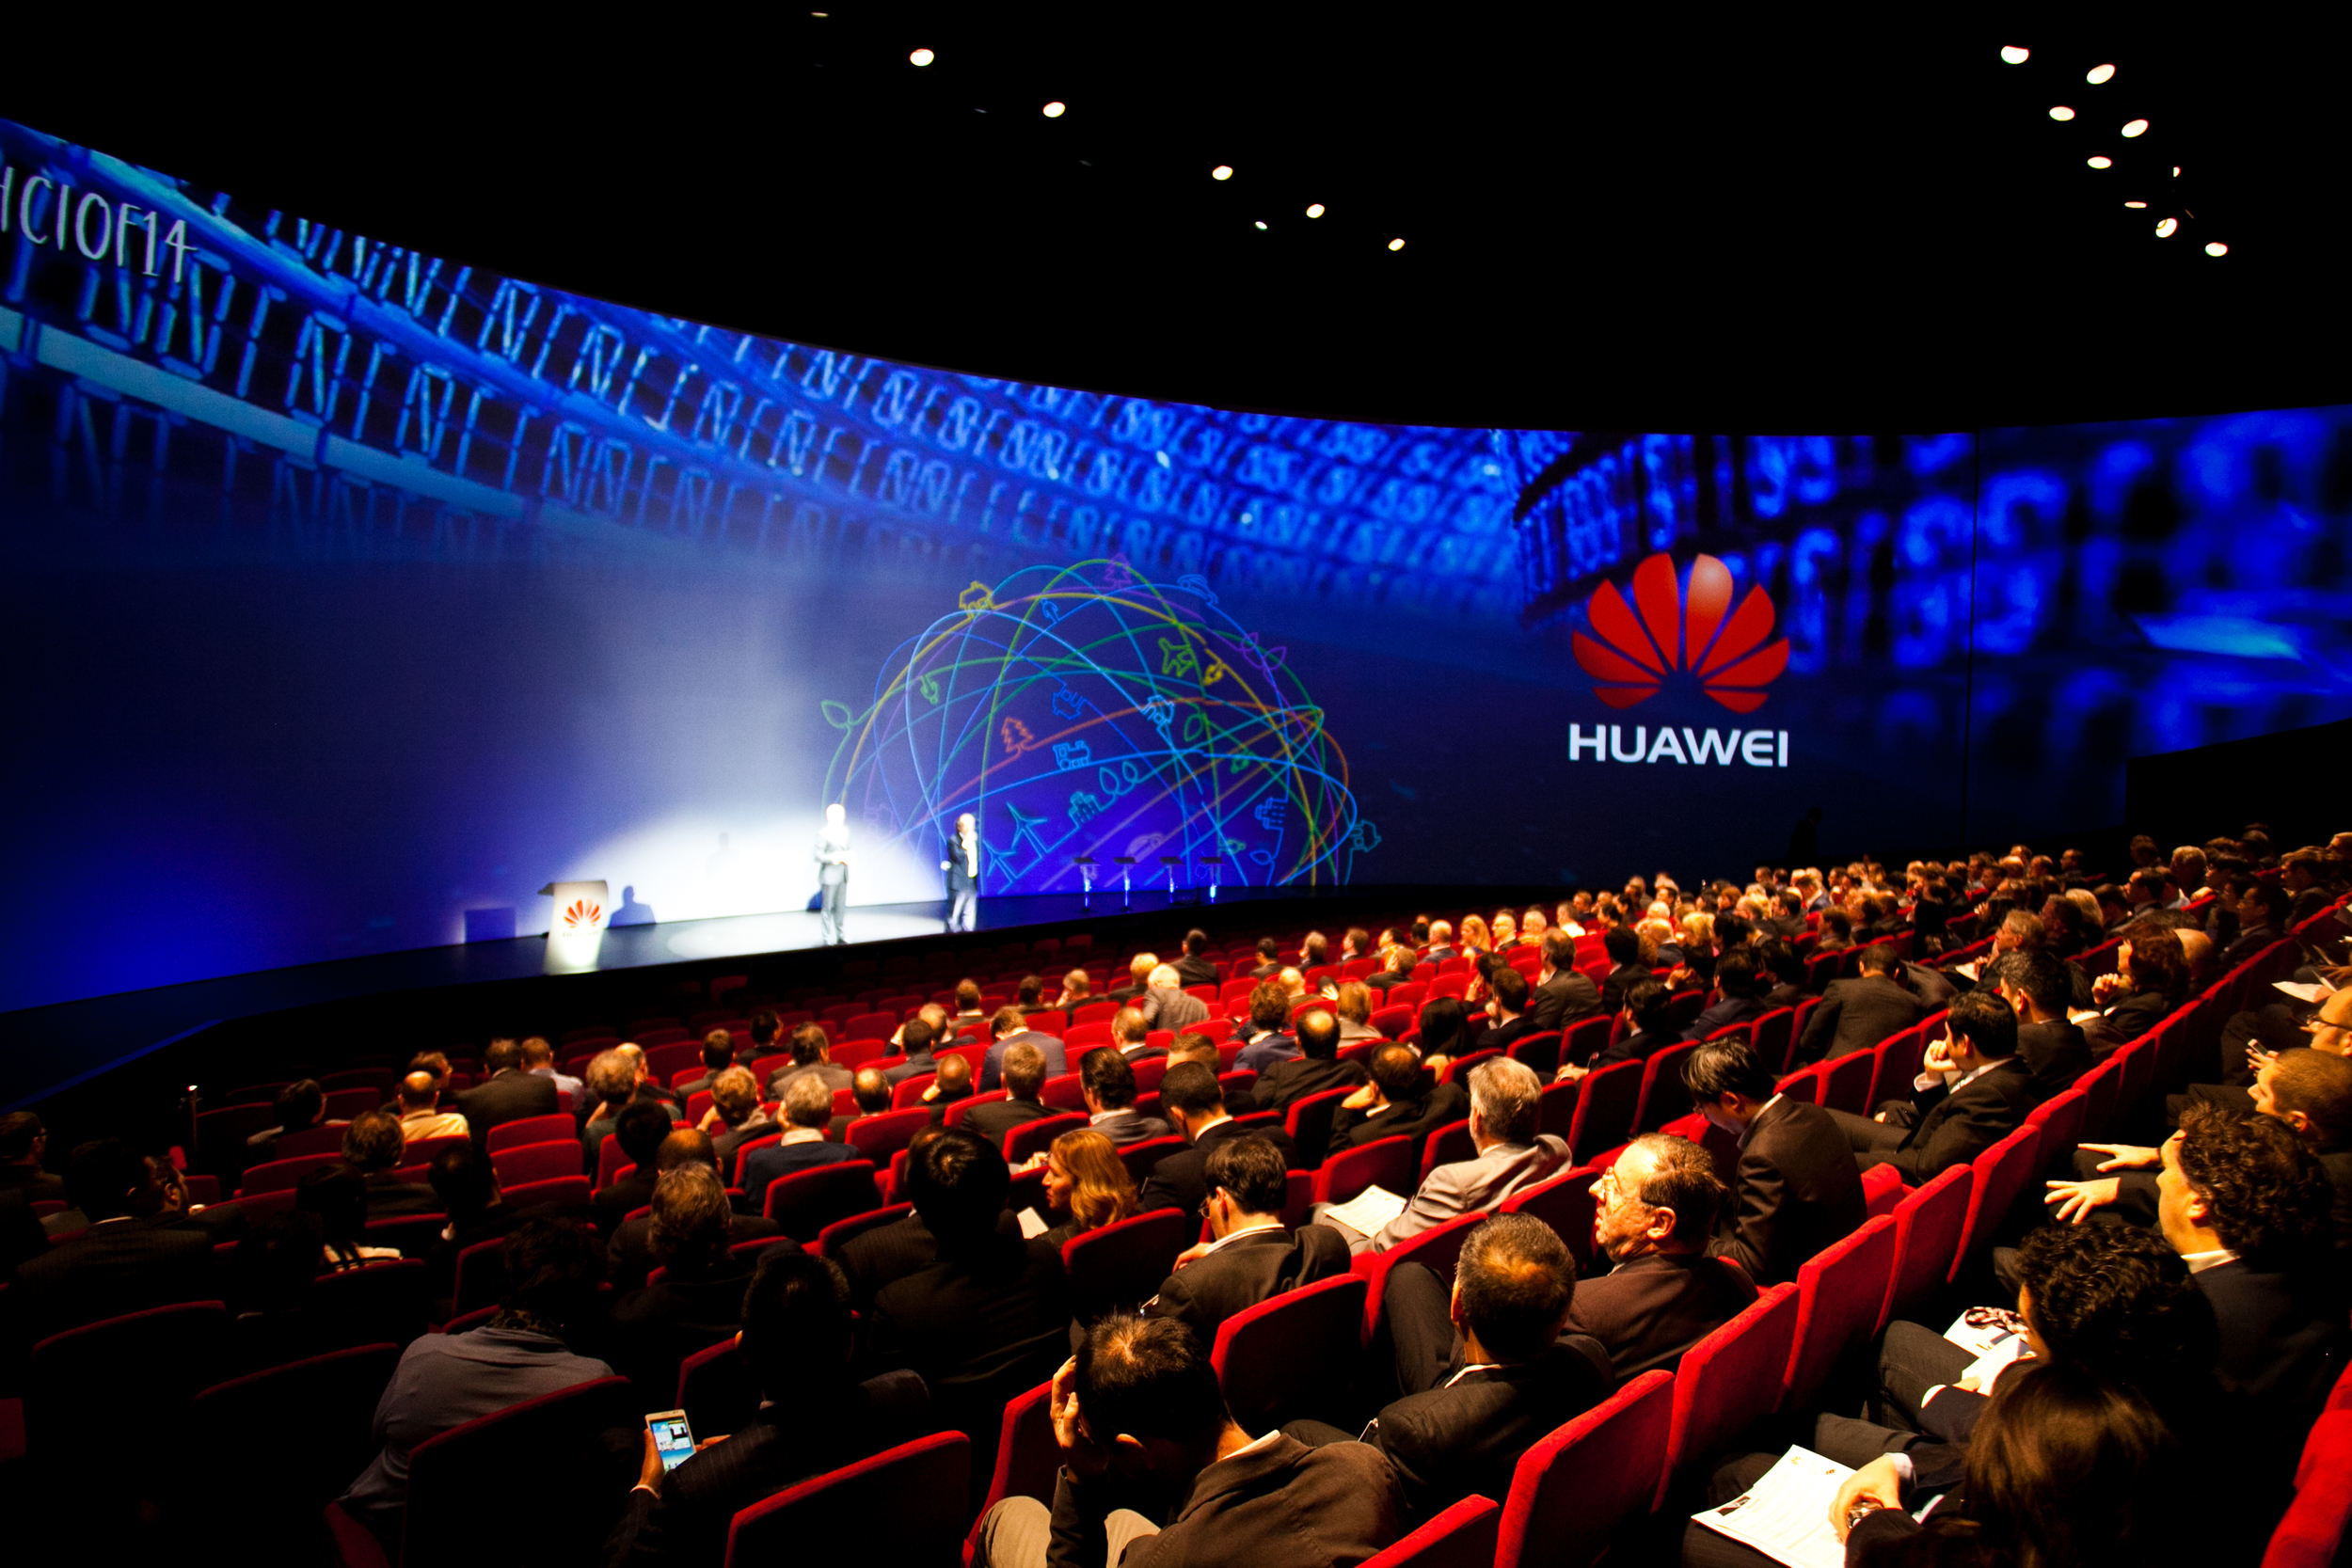 Huawei_CIO_Forum_2014-71.jpg